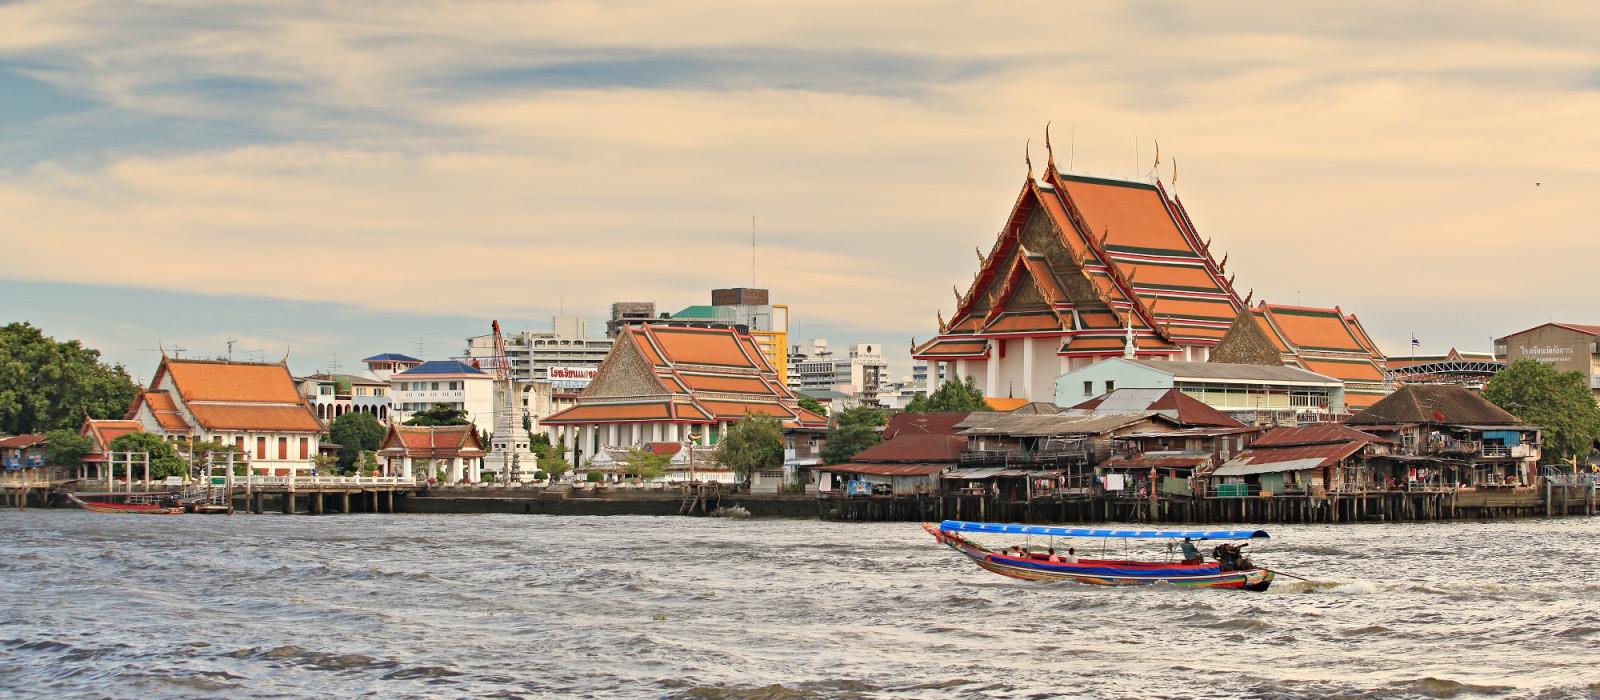 Landschaften, Luxus & Wellness in Asien Urlaub 1